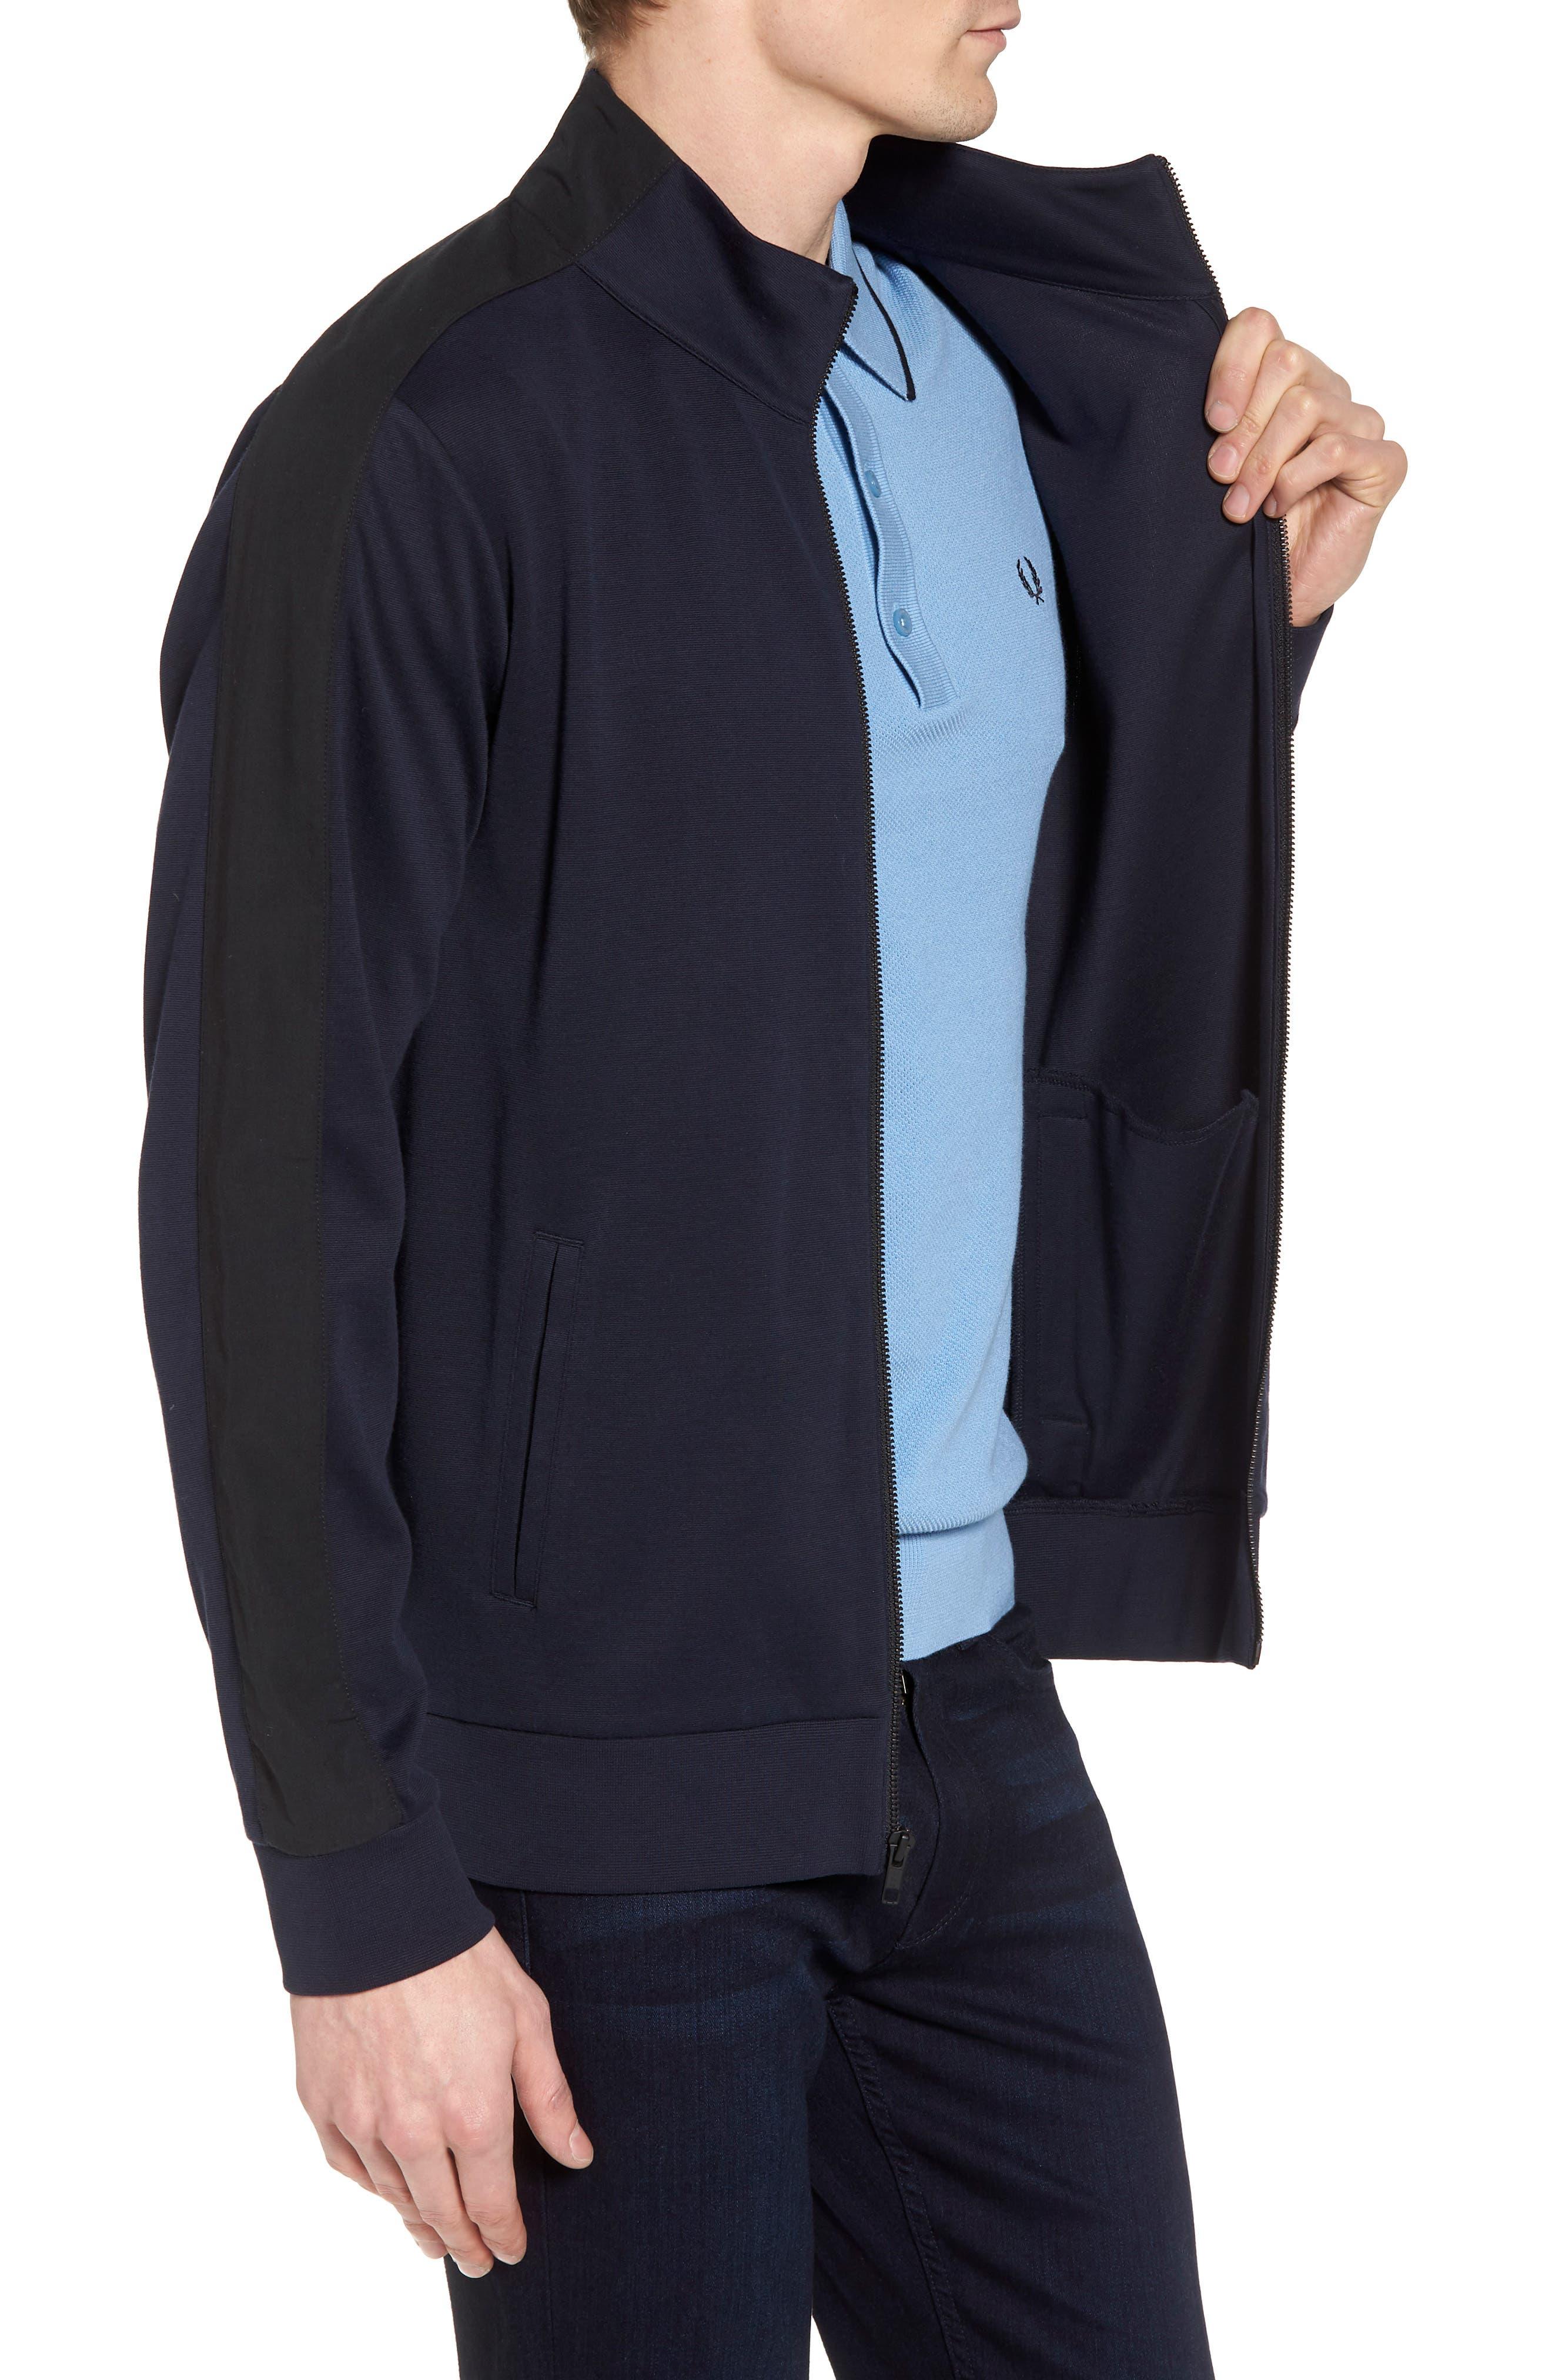 Fleece Jacket,                             Alternate thumbnail 3, color,                             Navy Night Black